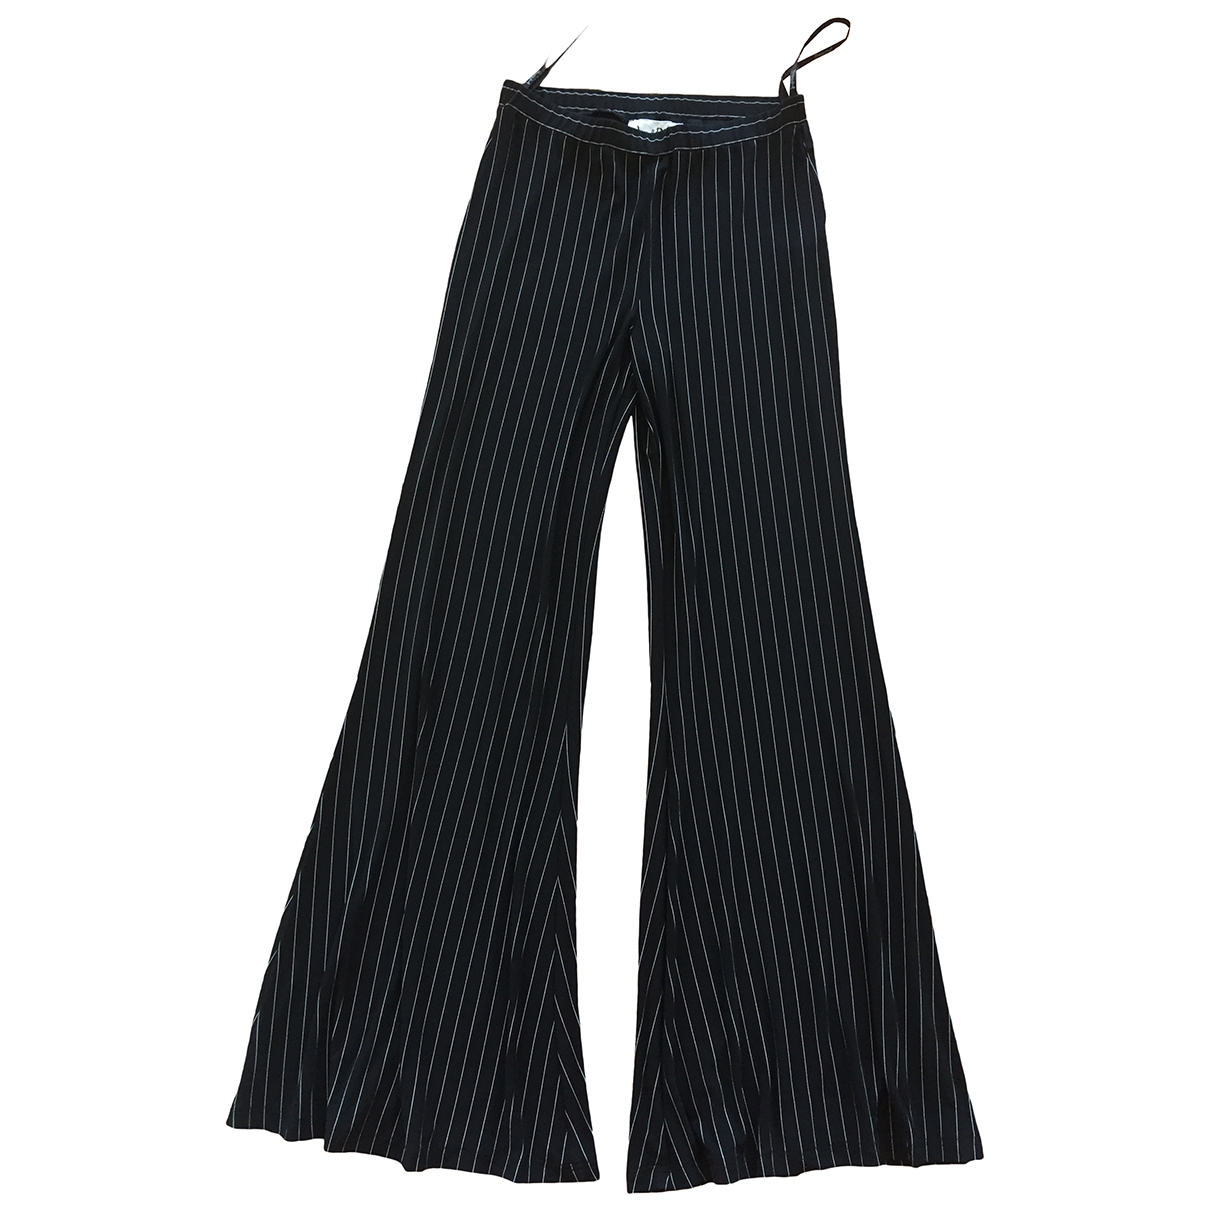 Joseph Ribkoff \N Black Trousers for Women 4 US